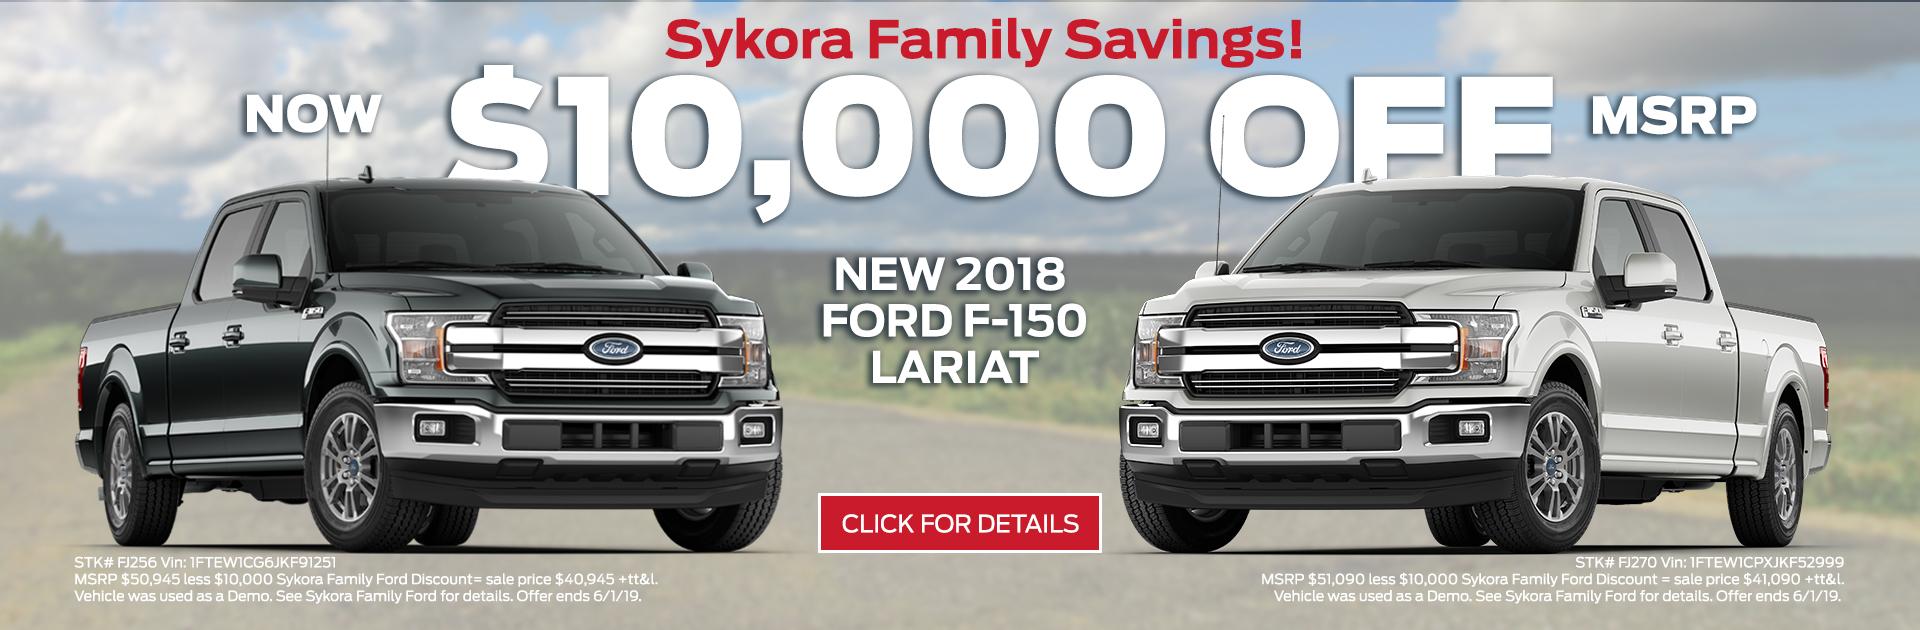 8bfcd23eb5733 Sykora Family Ford